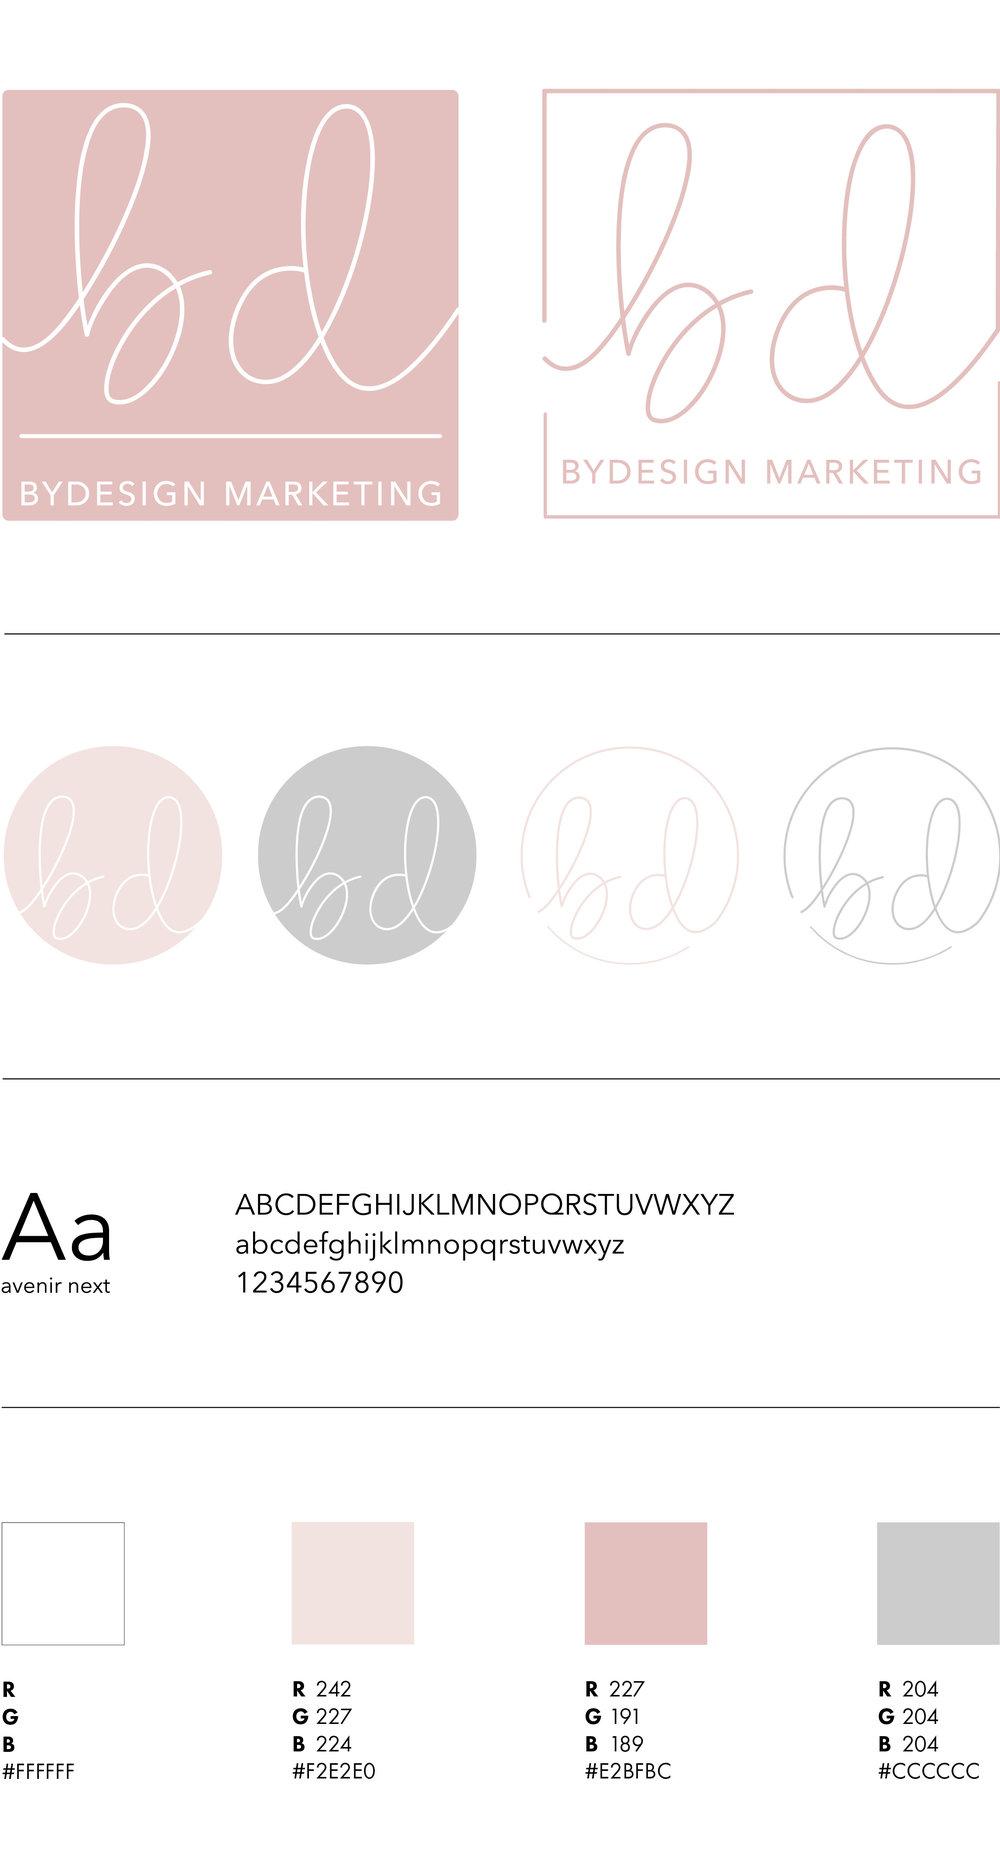 by design marketing